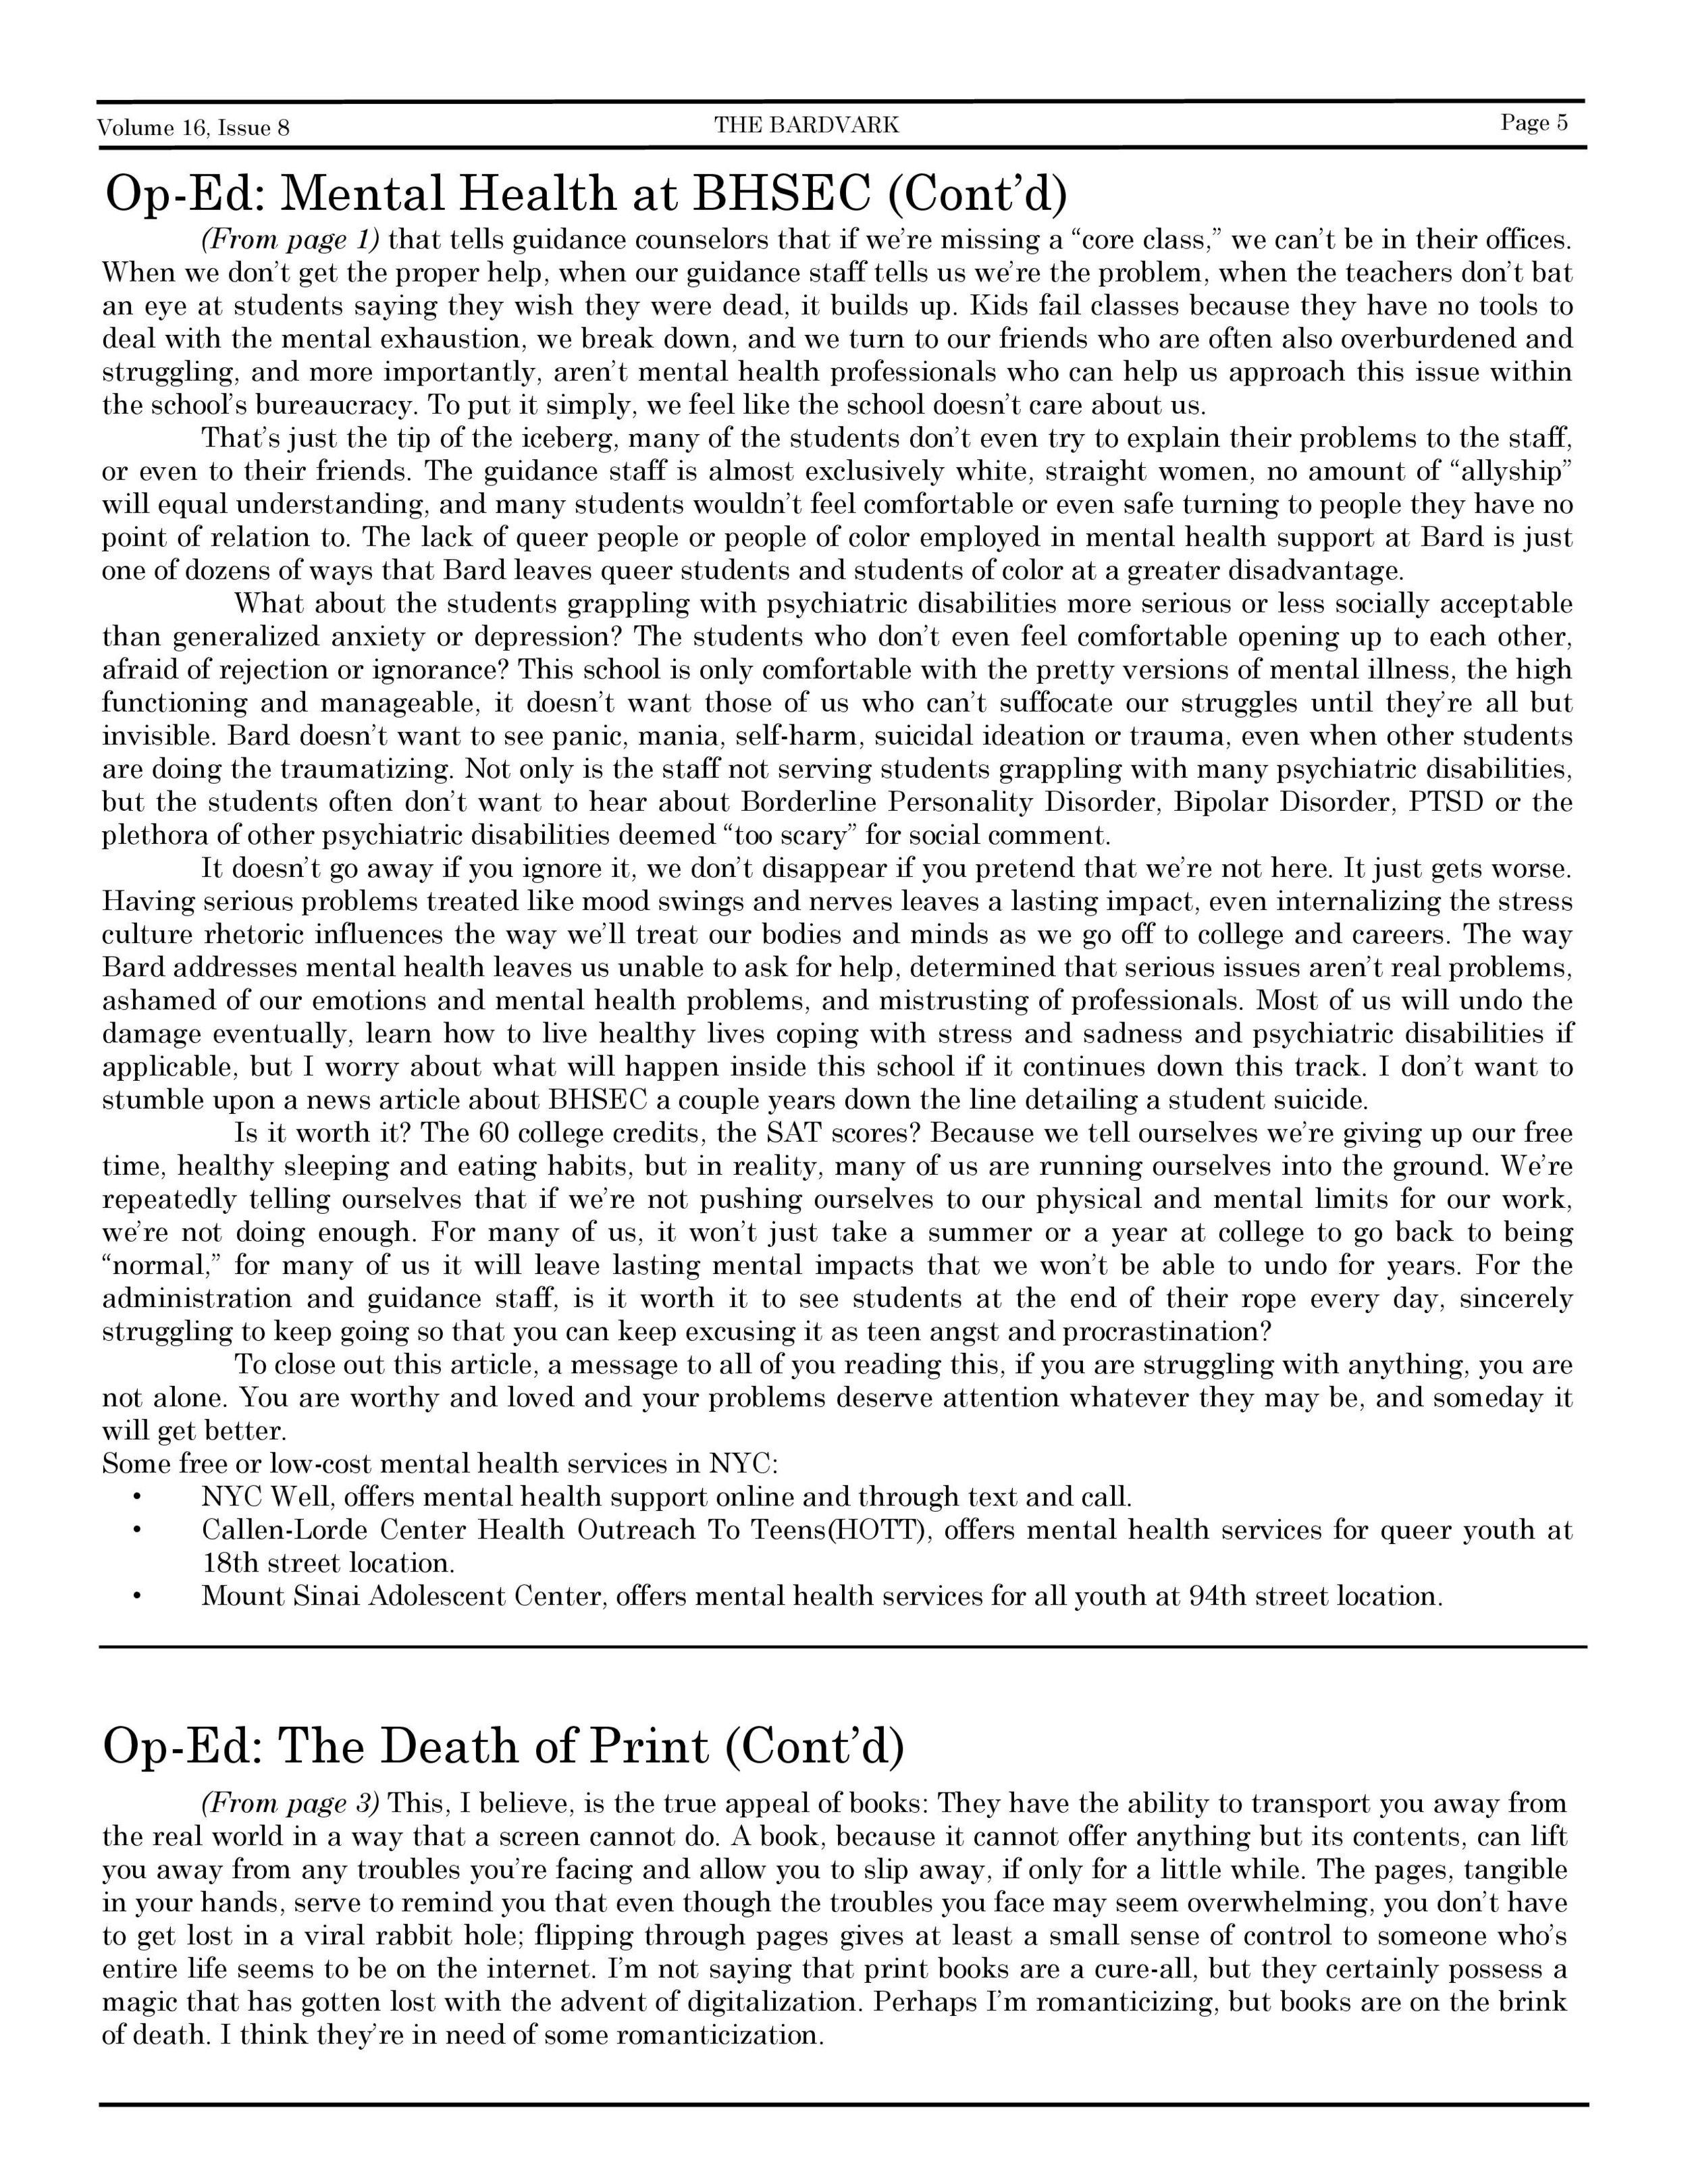 Issue 8 April 2019-5.jpg